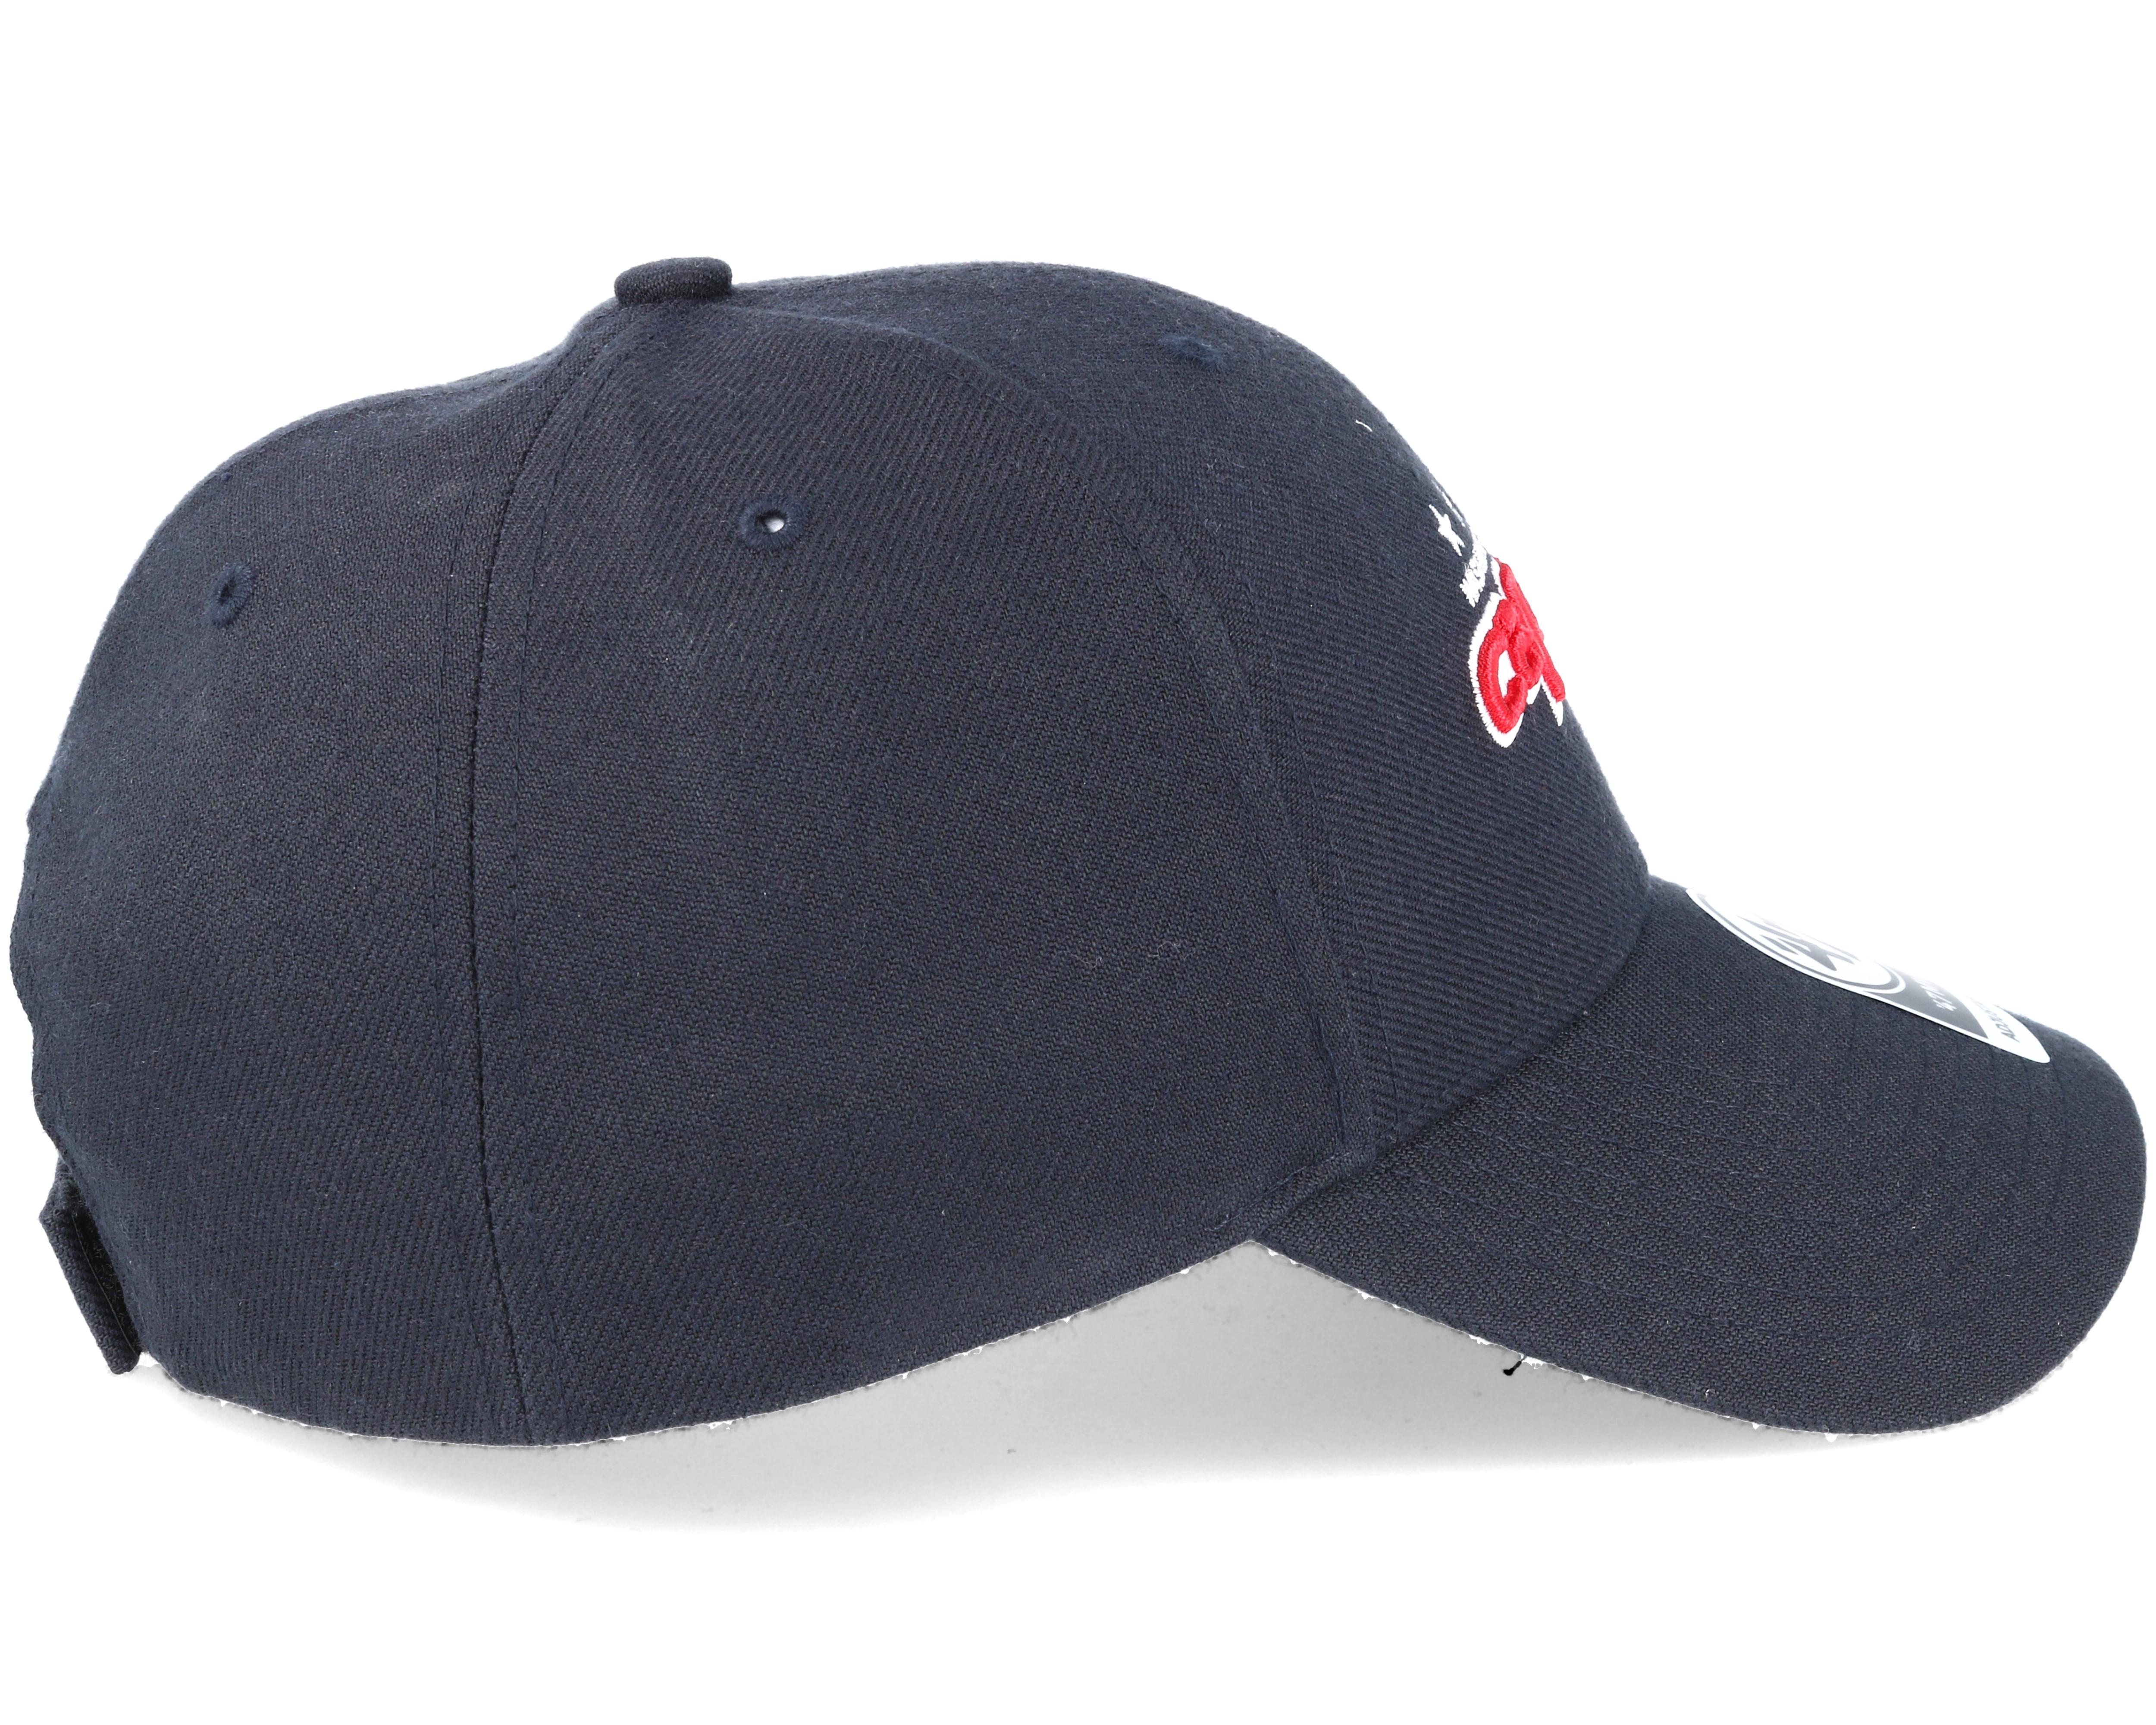 online store 5537c 2e56d Washington Capitals Mvp Navy Adjustable - 47 Brand caps ...